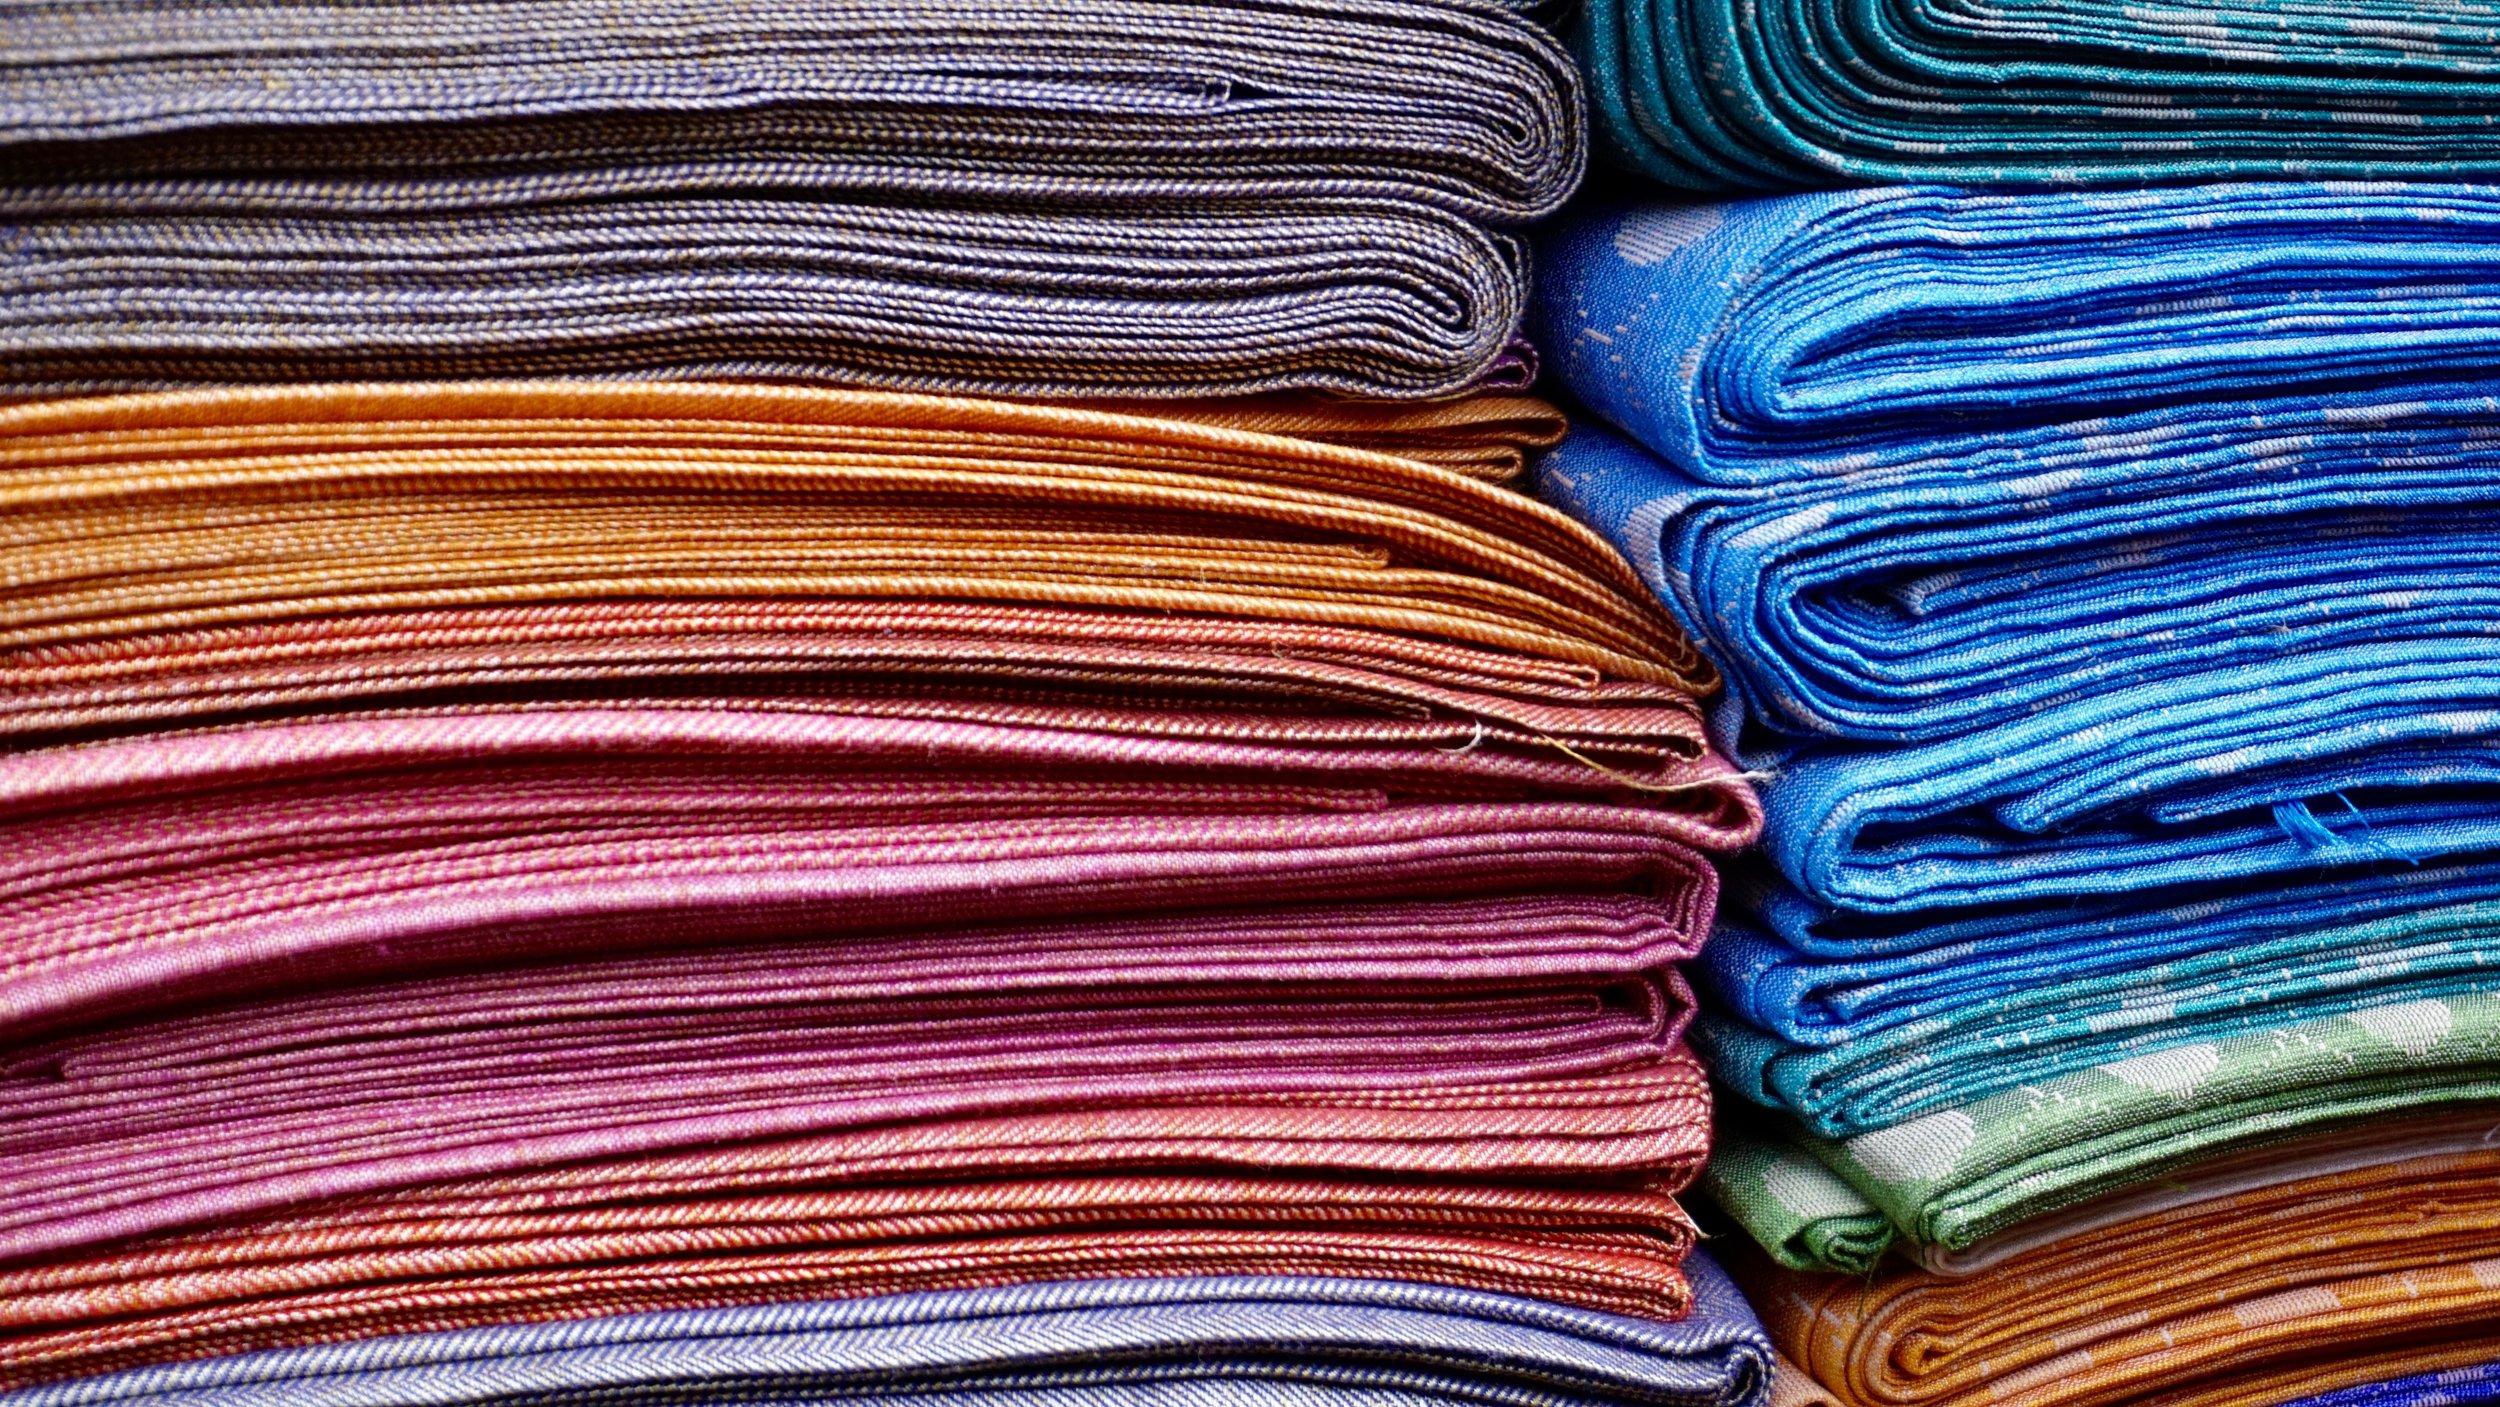 wool-fabric-manufacturing.jpg